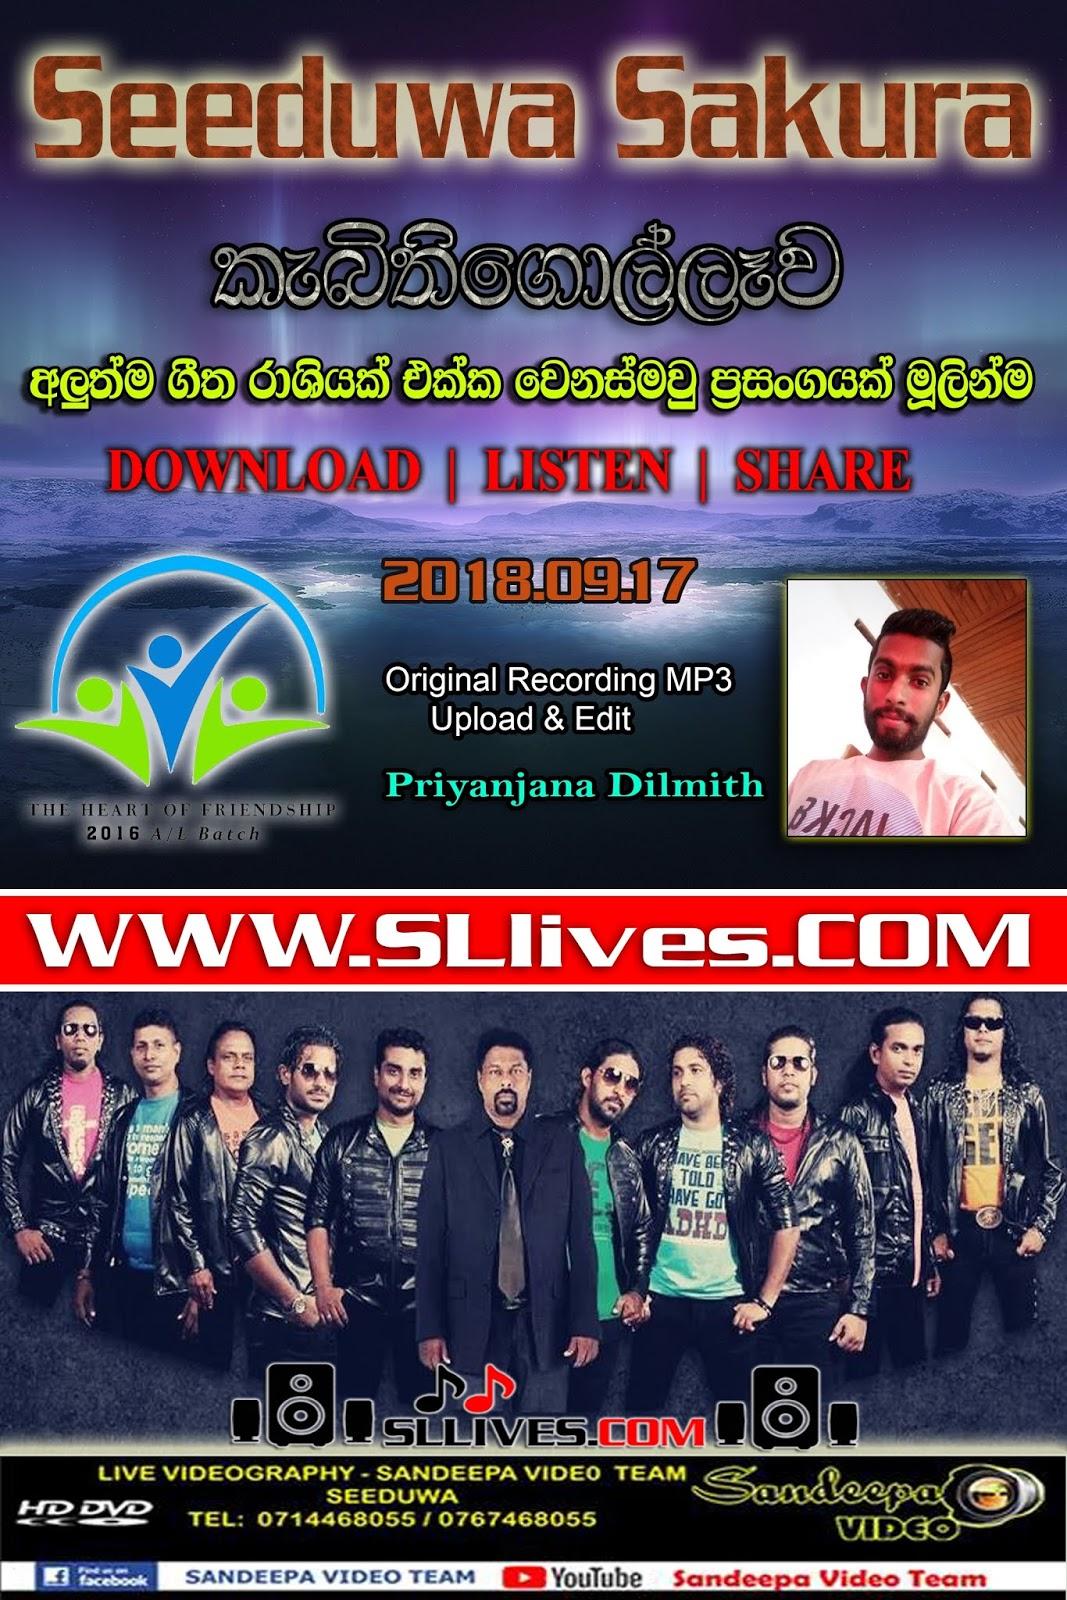 Seeduwa sakura nonstop free download